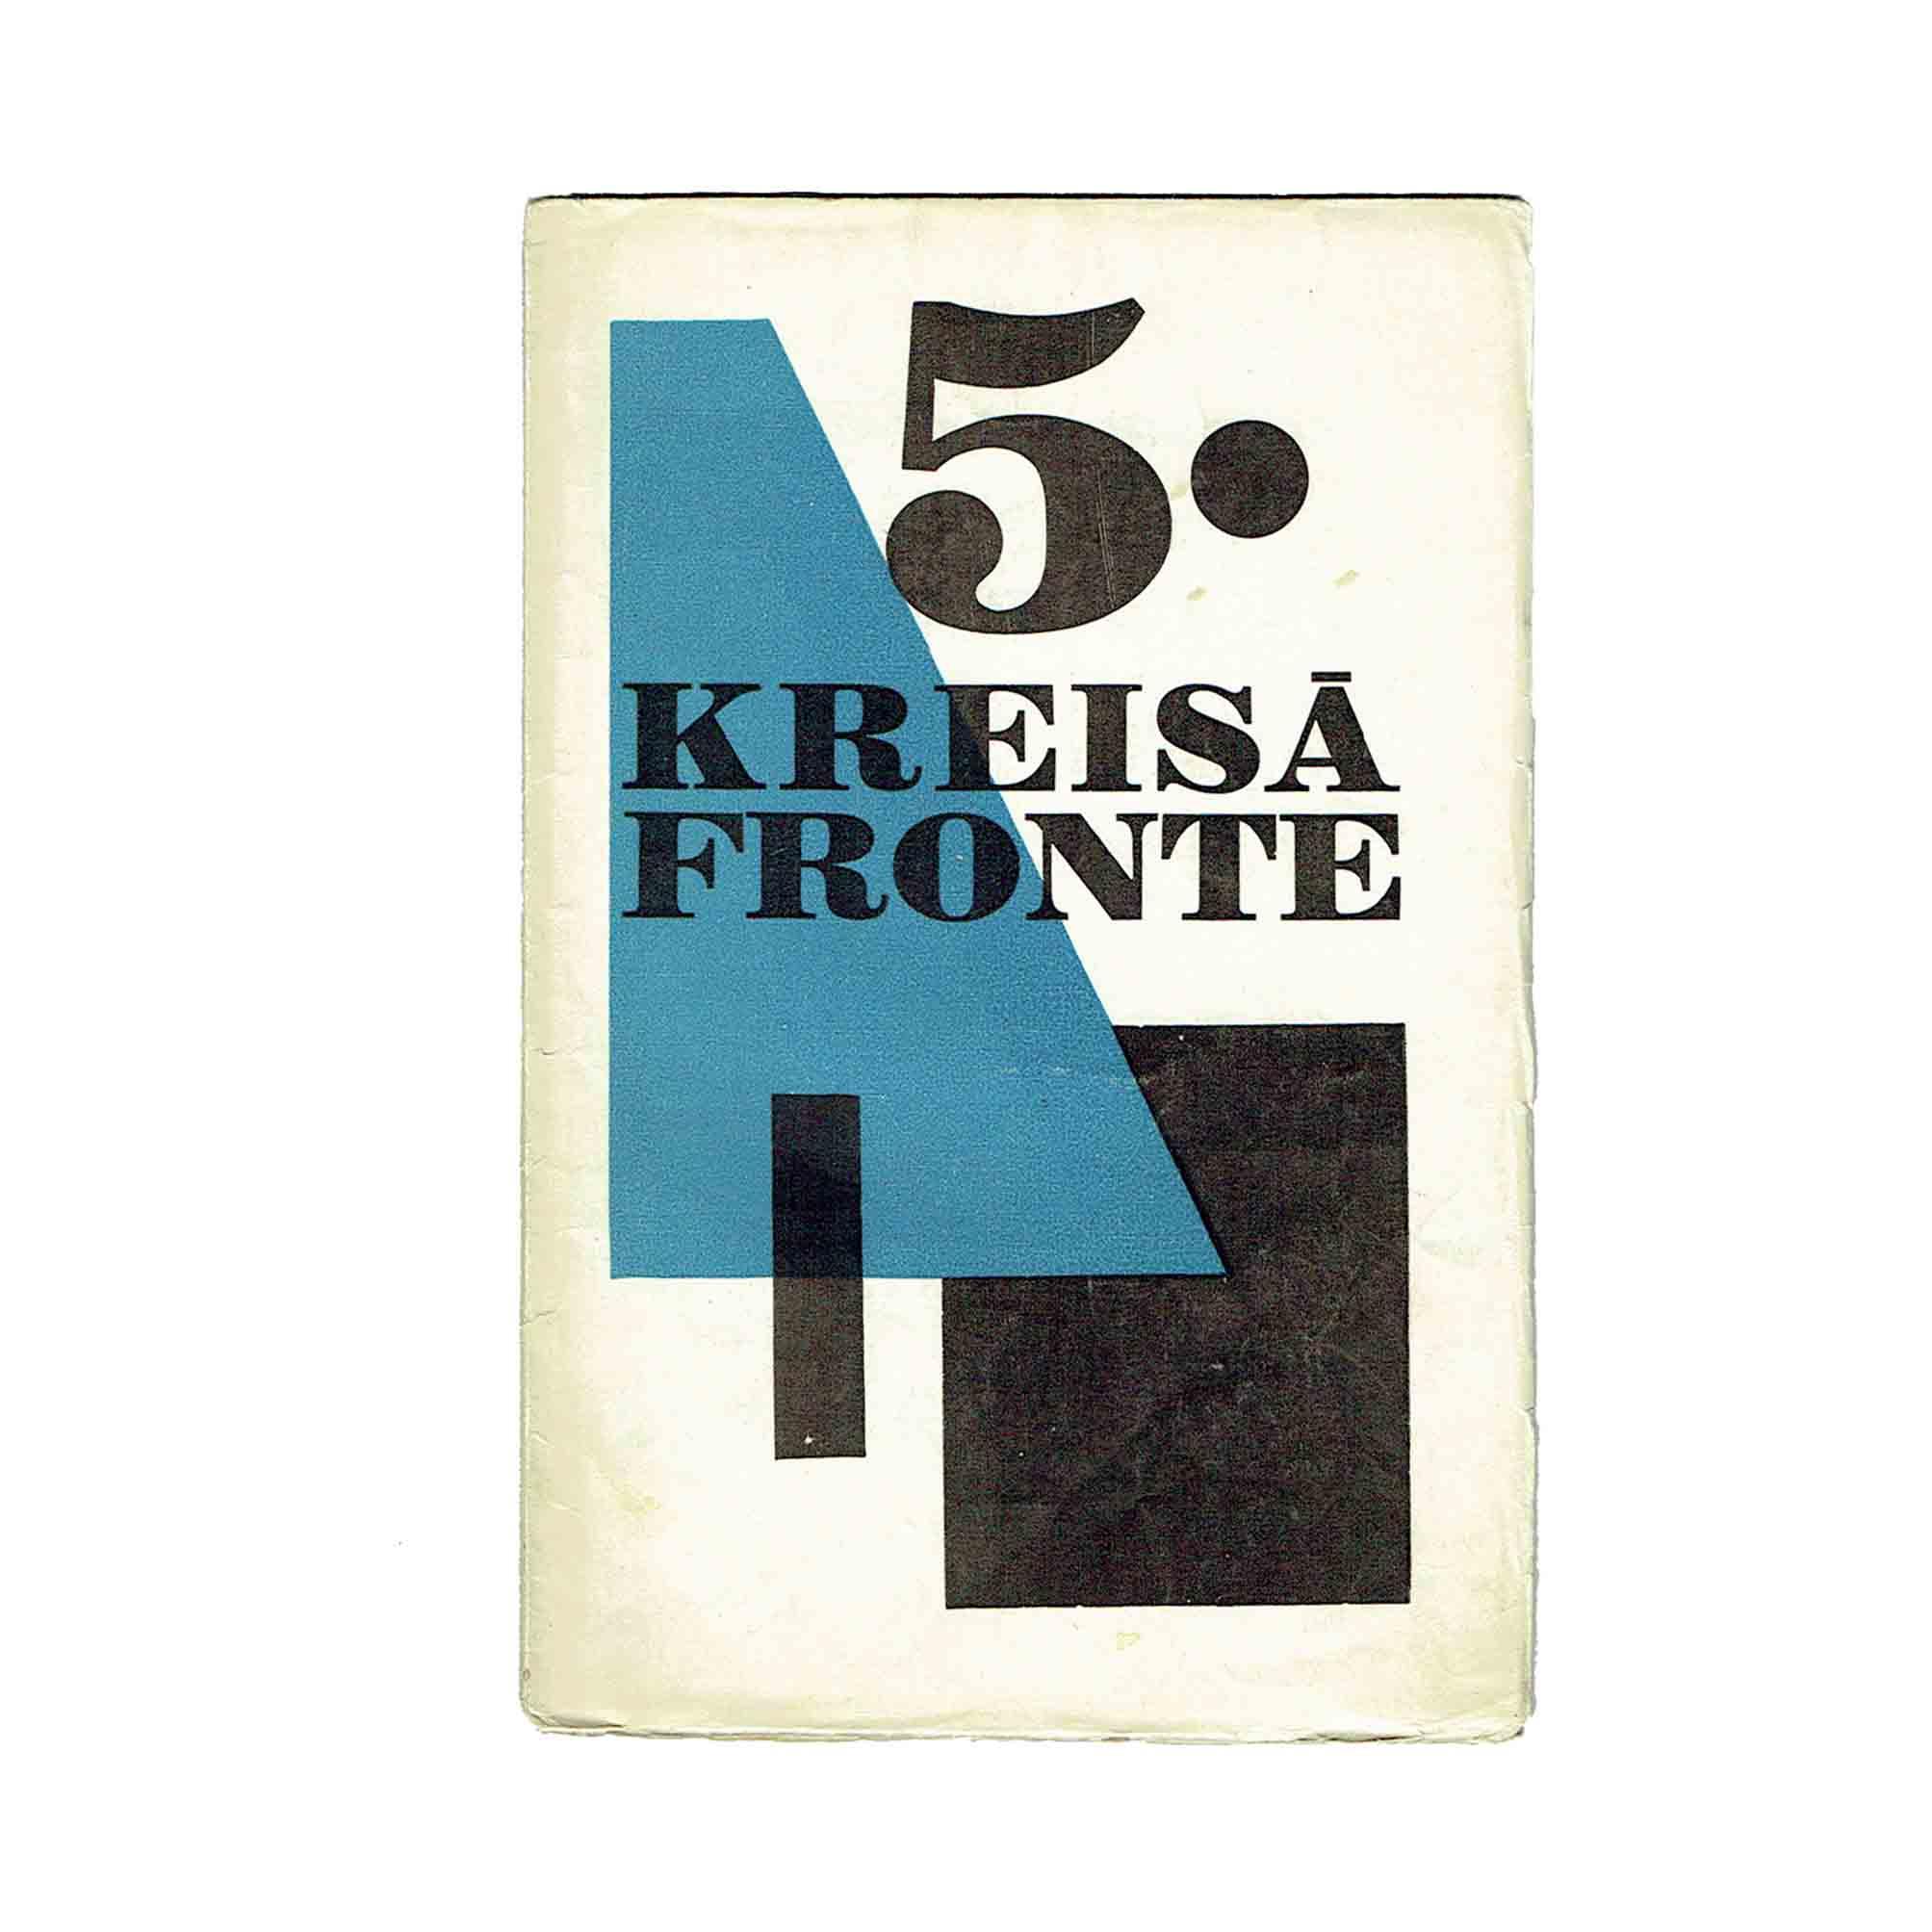 5835K-Kreisa-Front-5-1929-Umschlag-recto-frei-N.jpeg